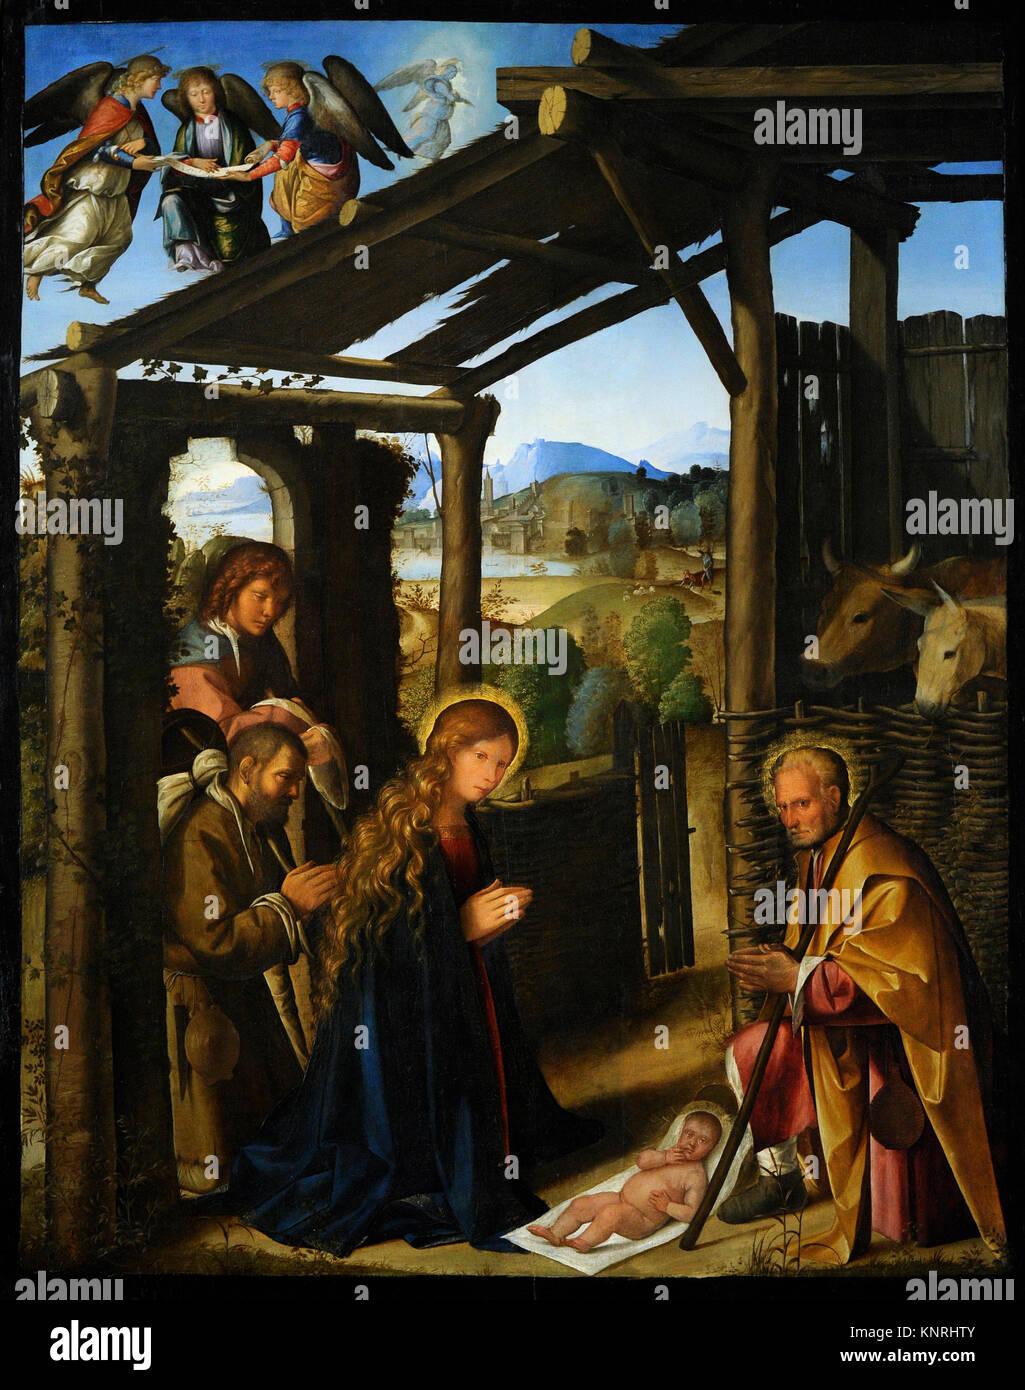 Boccaccio Boccaccino (1466/1467-1524/1525). Italian painter. Adoration of the shepherds, ca.1500-1507. Bourbon Collection. - Stock Image